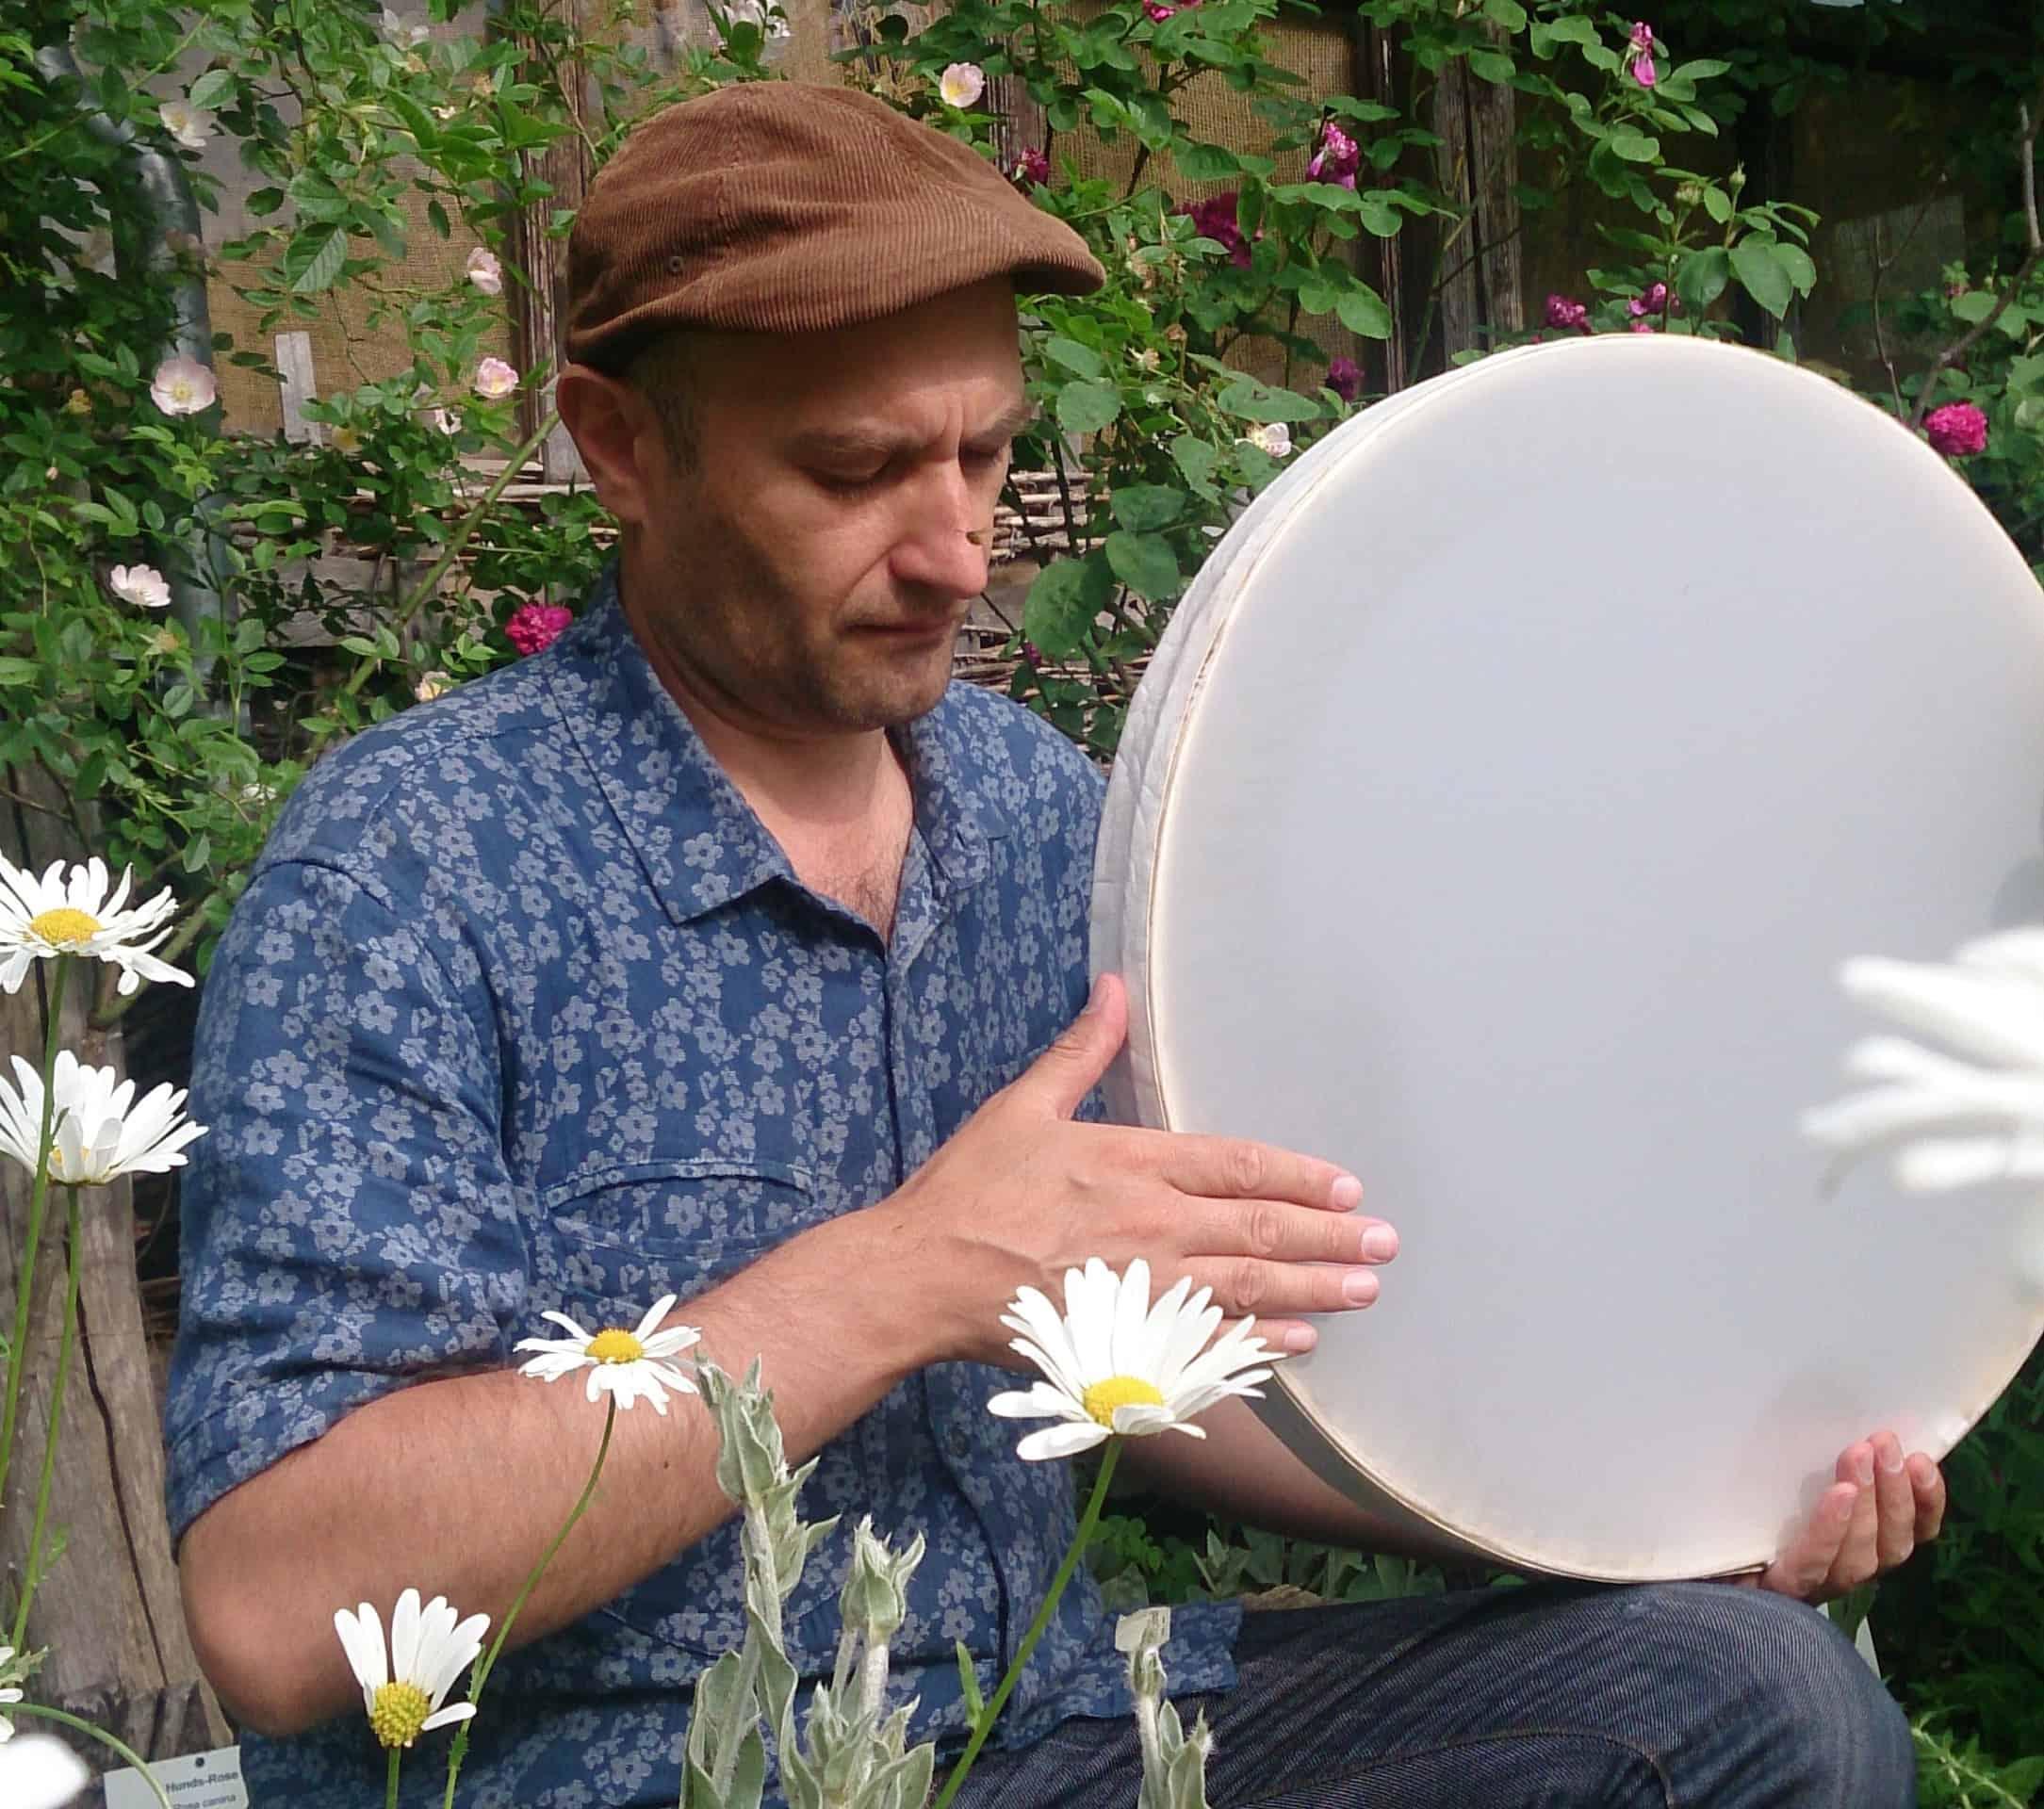 Lebendiges Herz - den inneren Garten zum blühen bringen